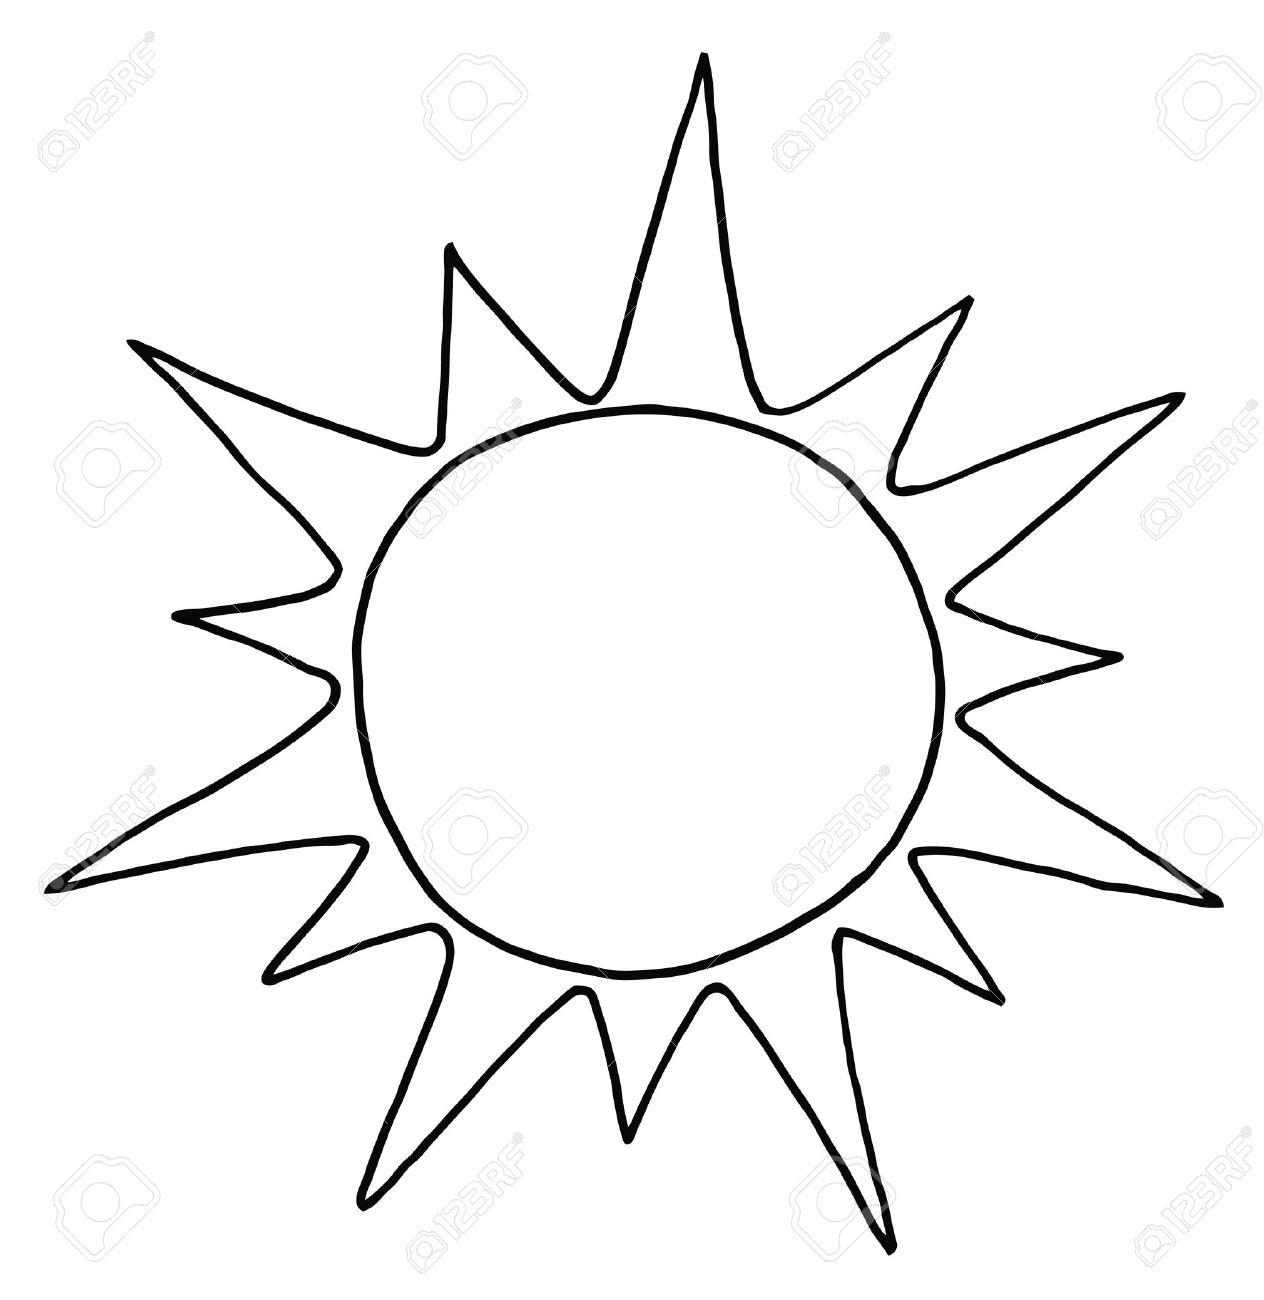 Clipart sun black and white - .